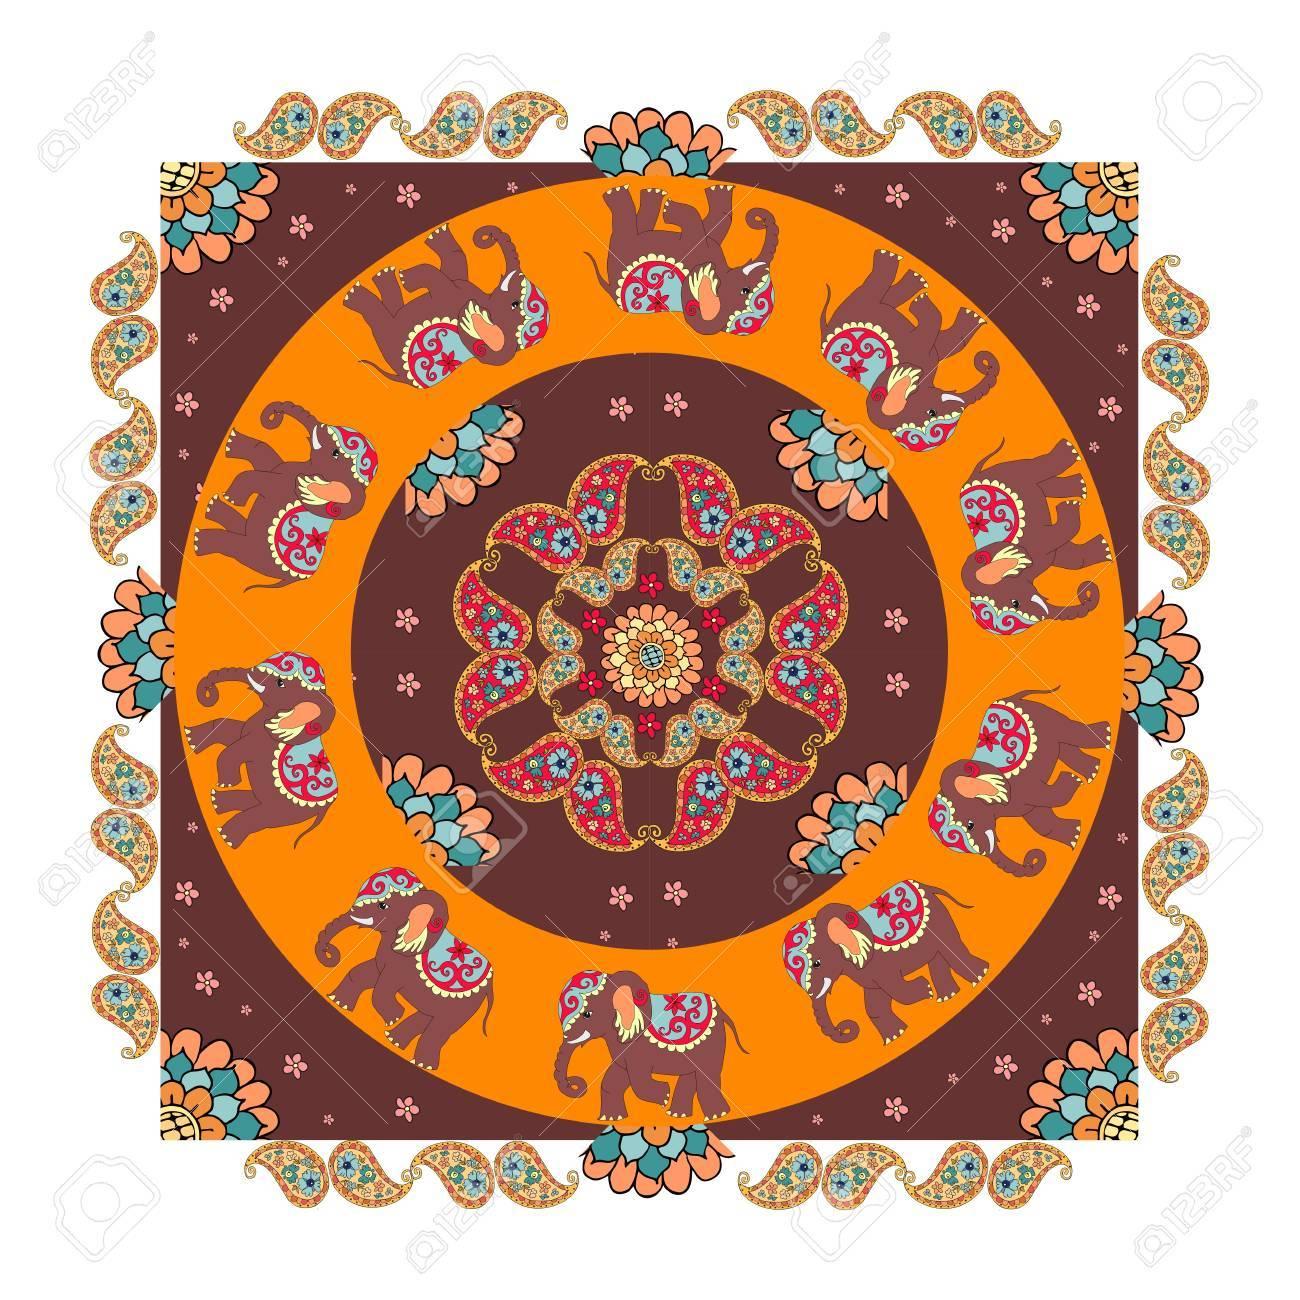 Ethnic Bandana Print With Beautiful Flowers Paisley And Elephants Summer Kerchief Square